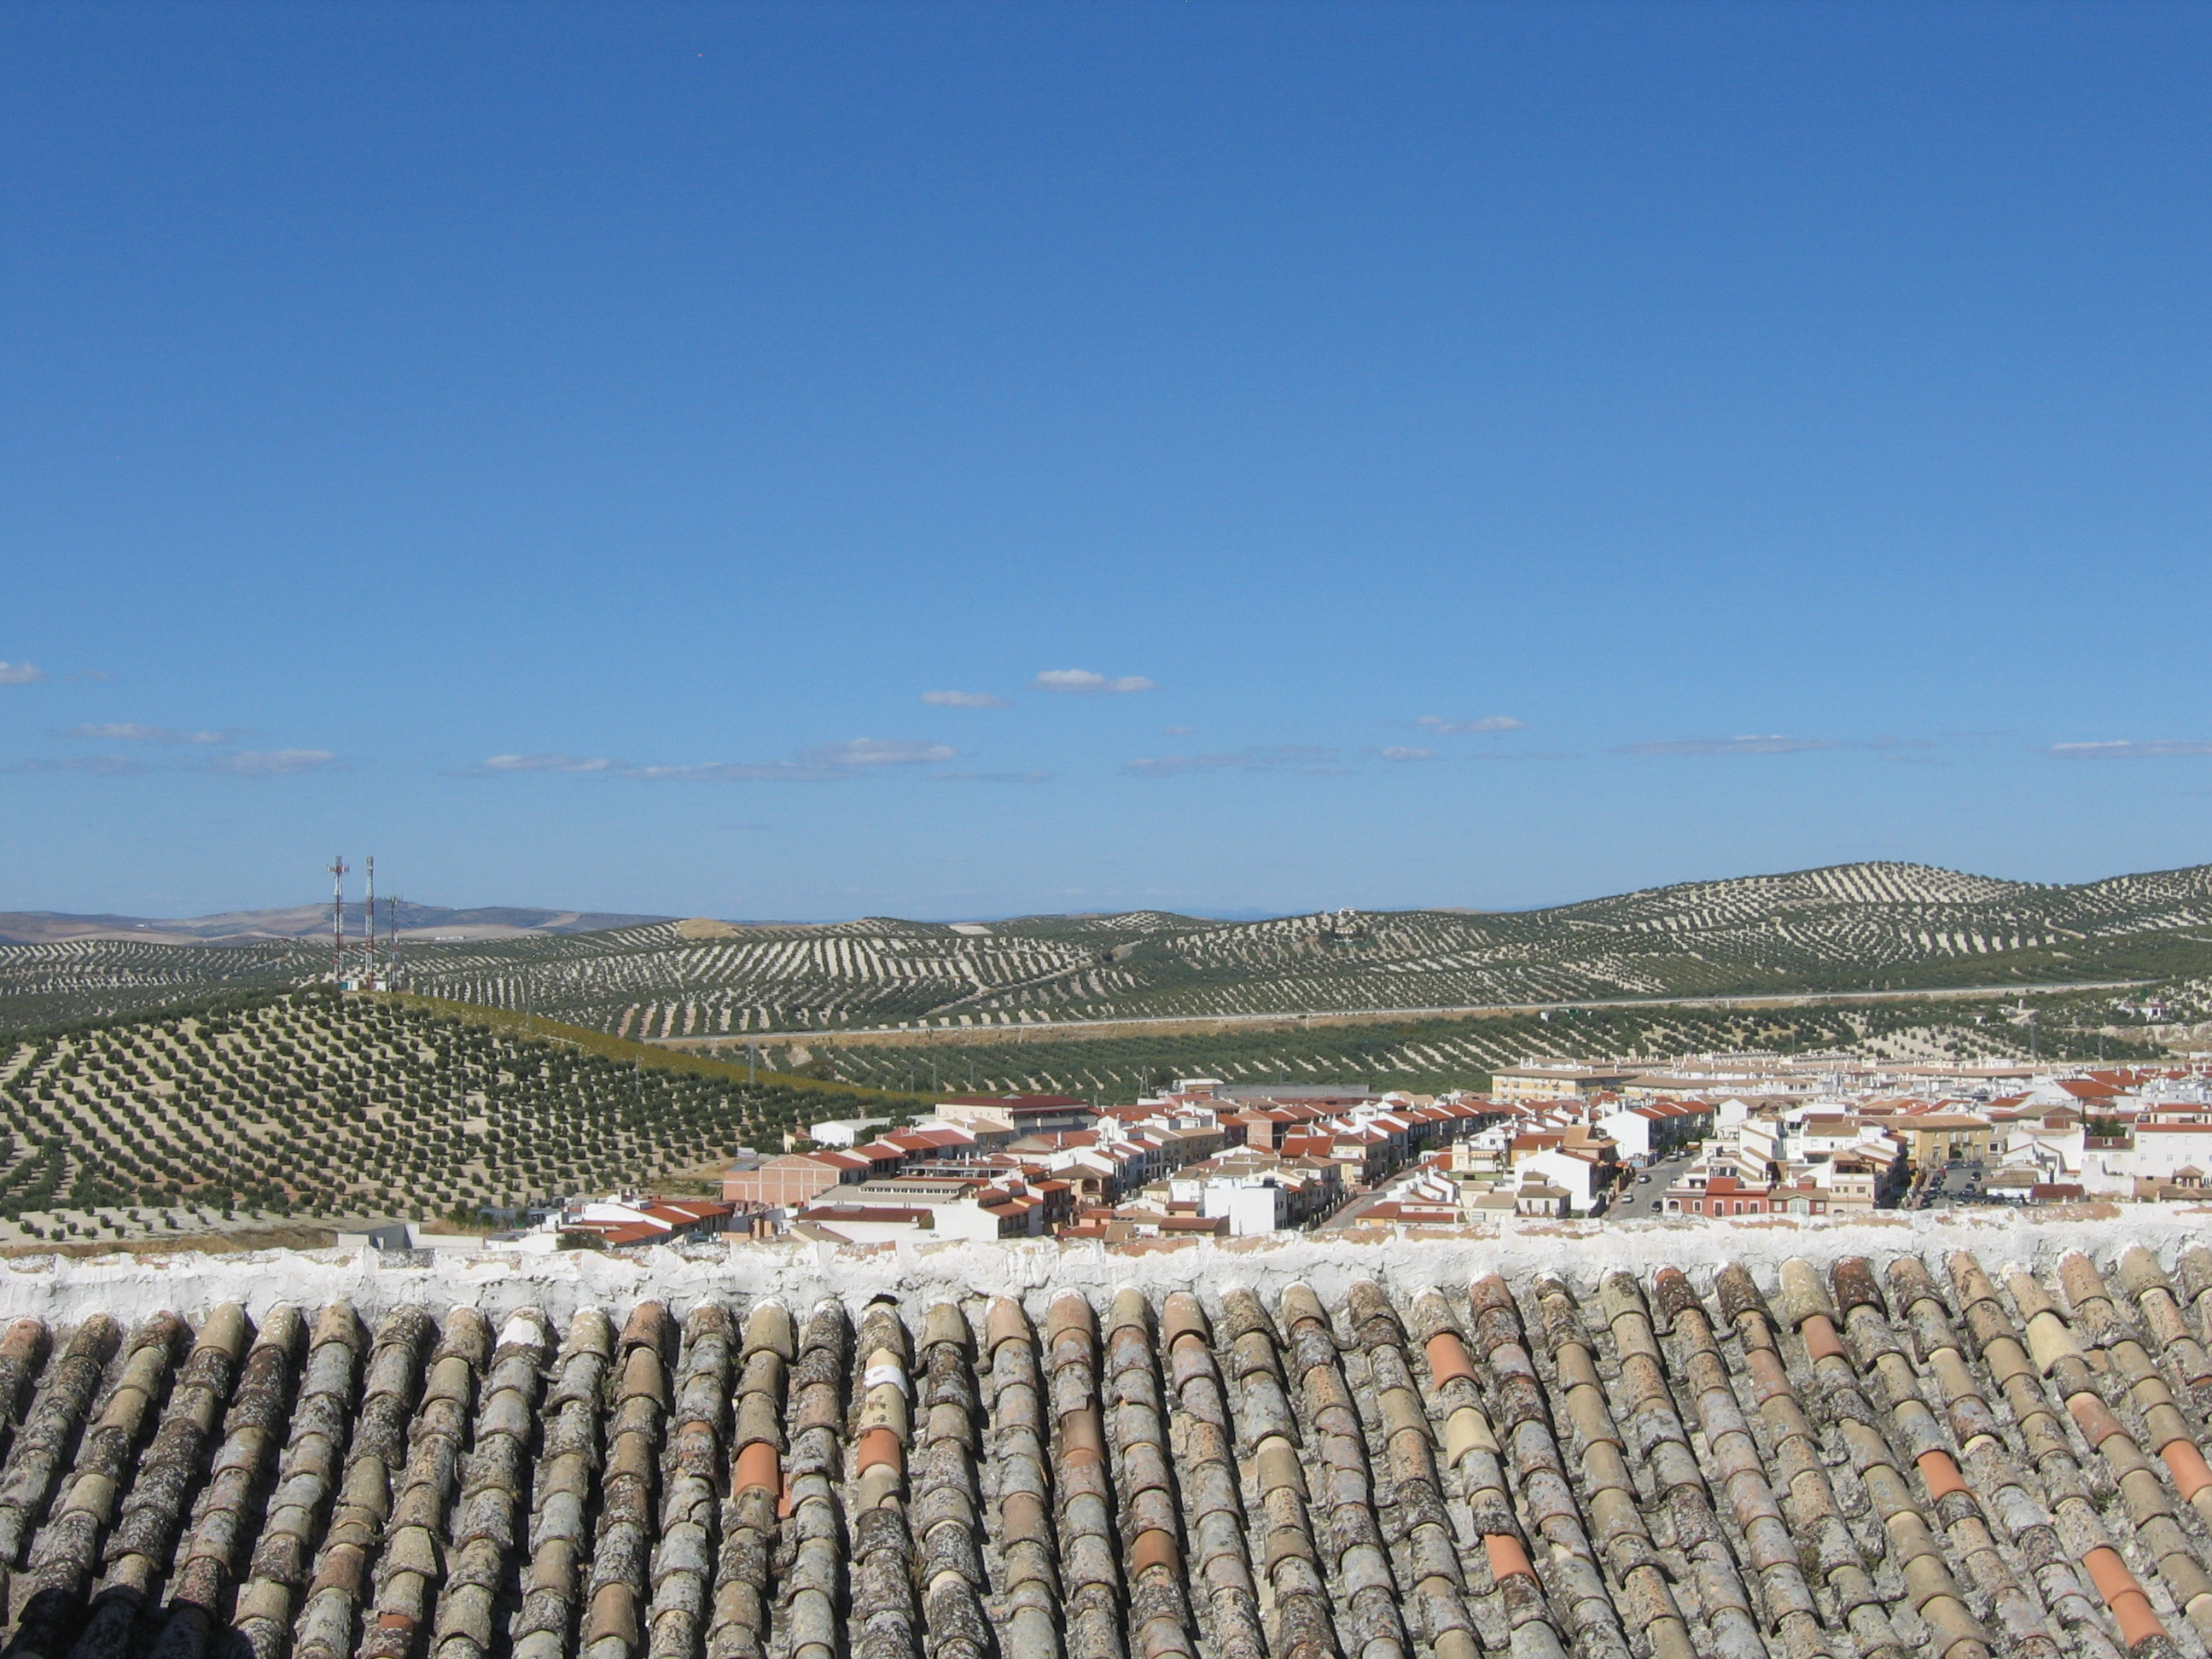 Oliviers d'Andalousie